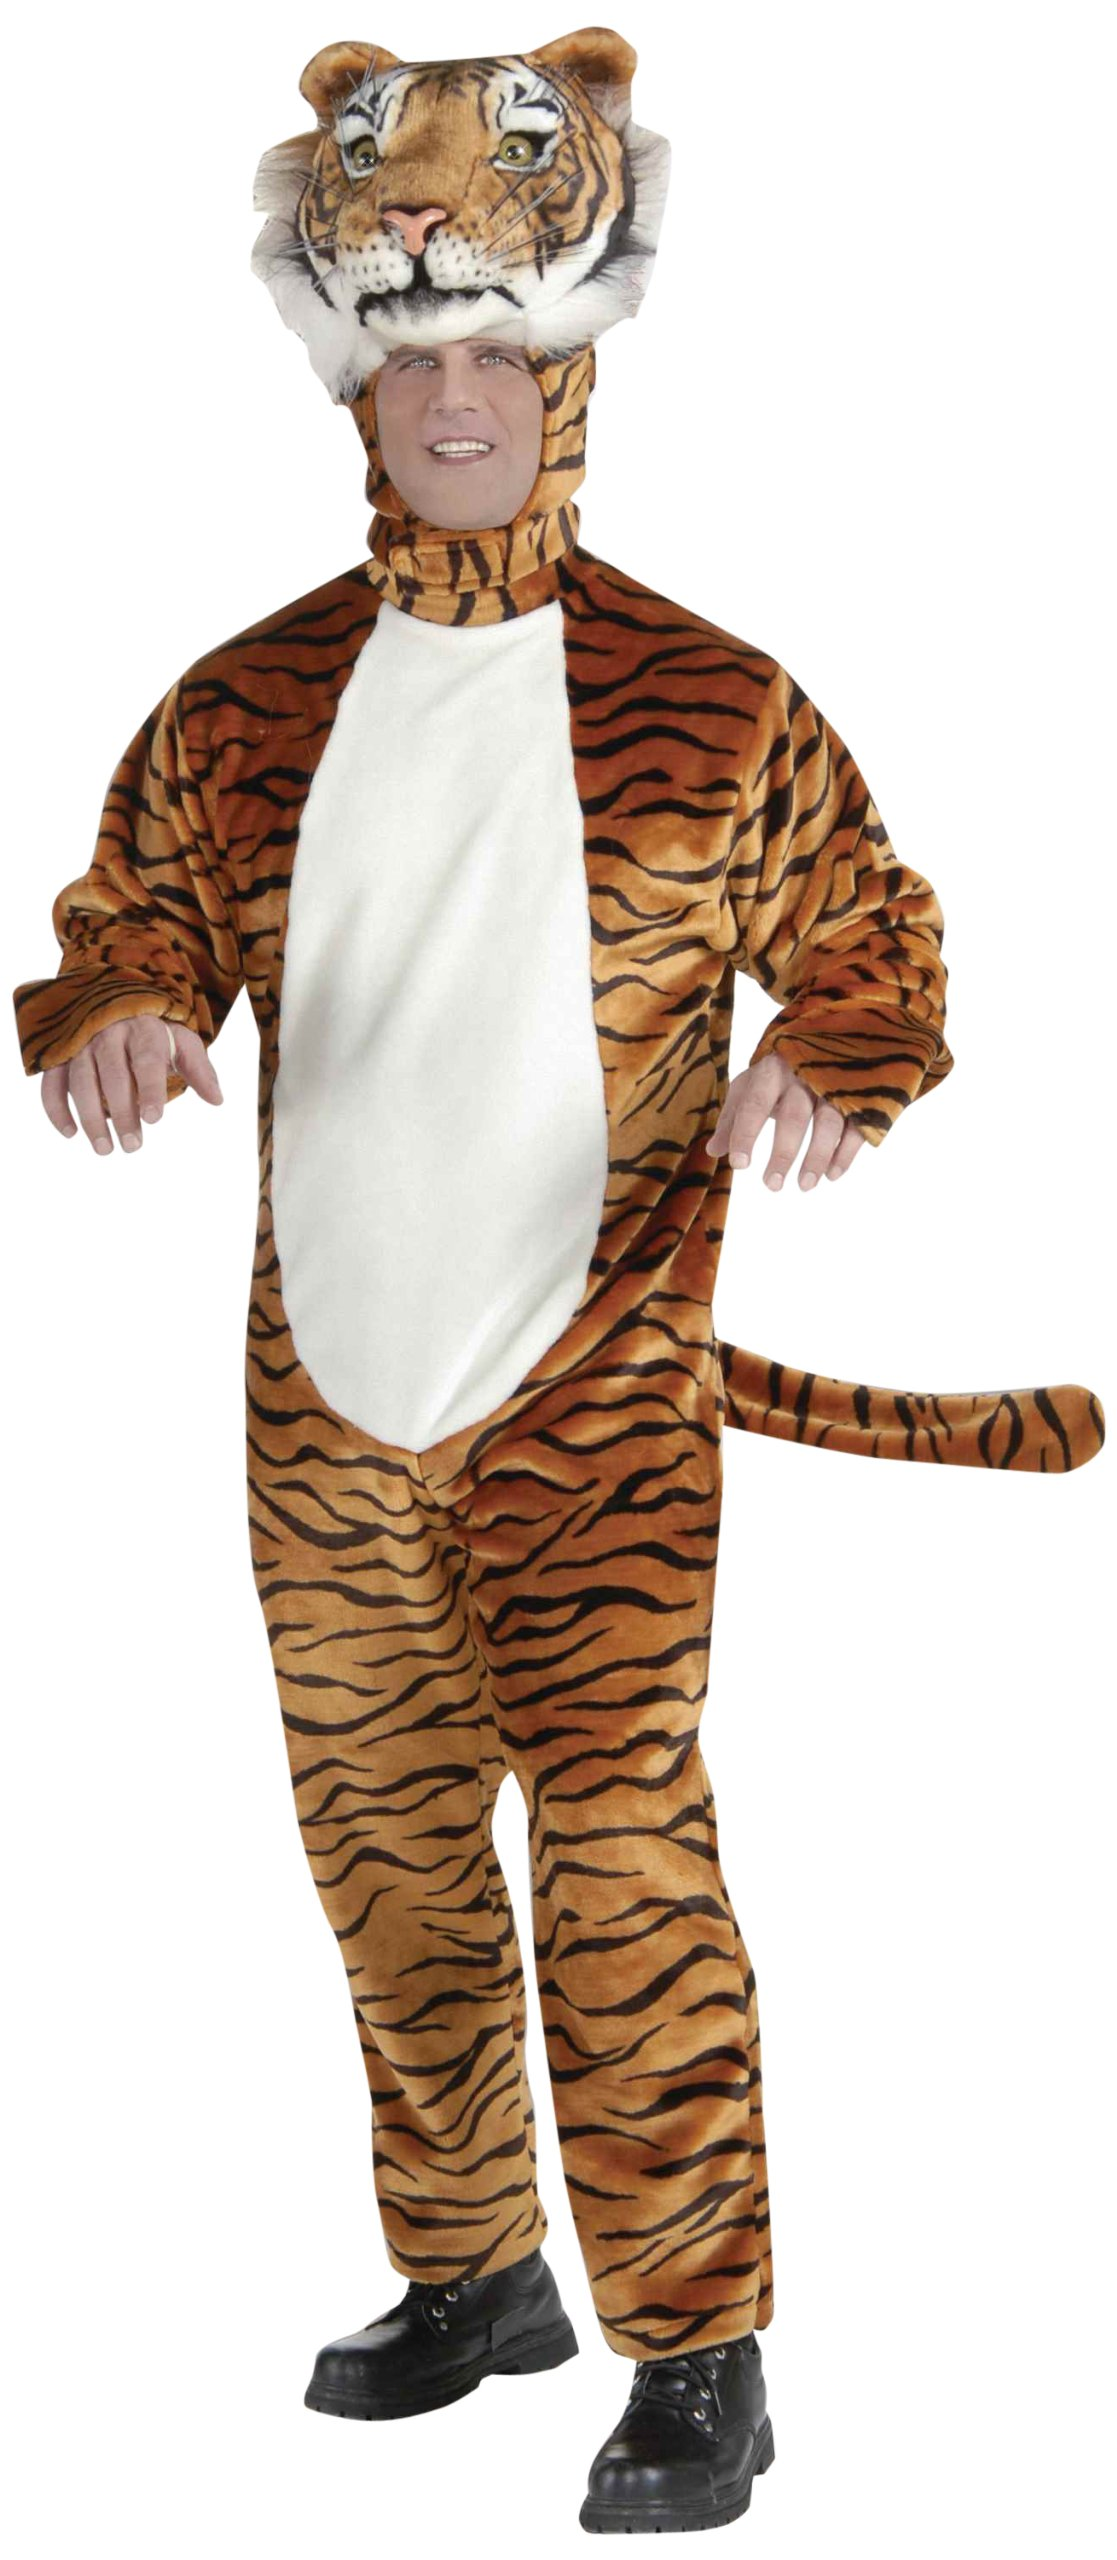 Forum Novelties Men's Deluxe Plush Tiger Mascot Adult Costume, Orange, Standard